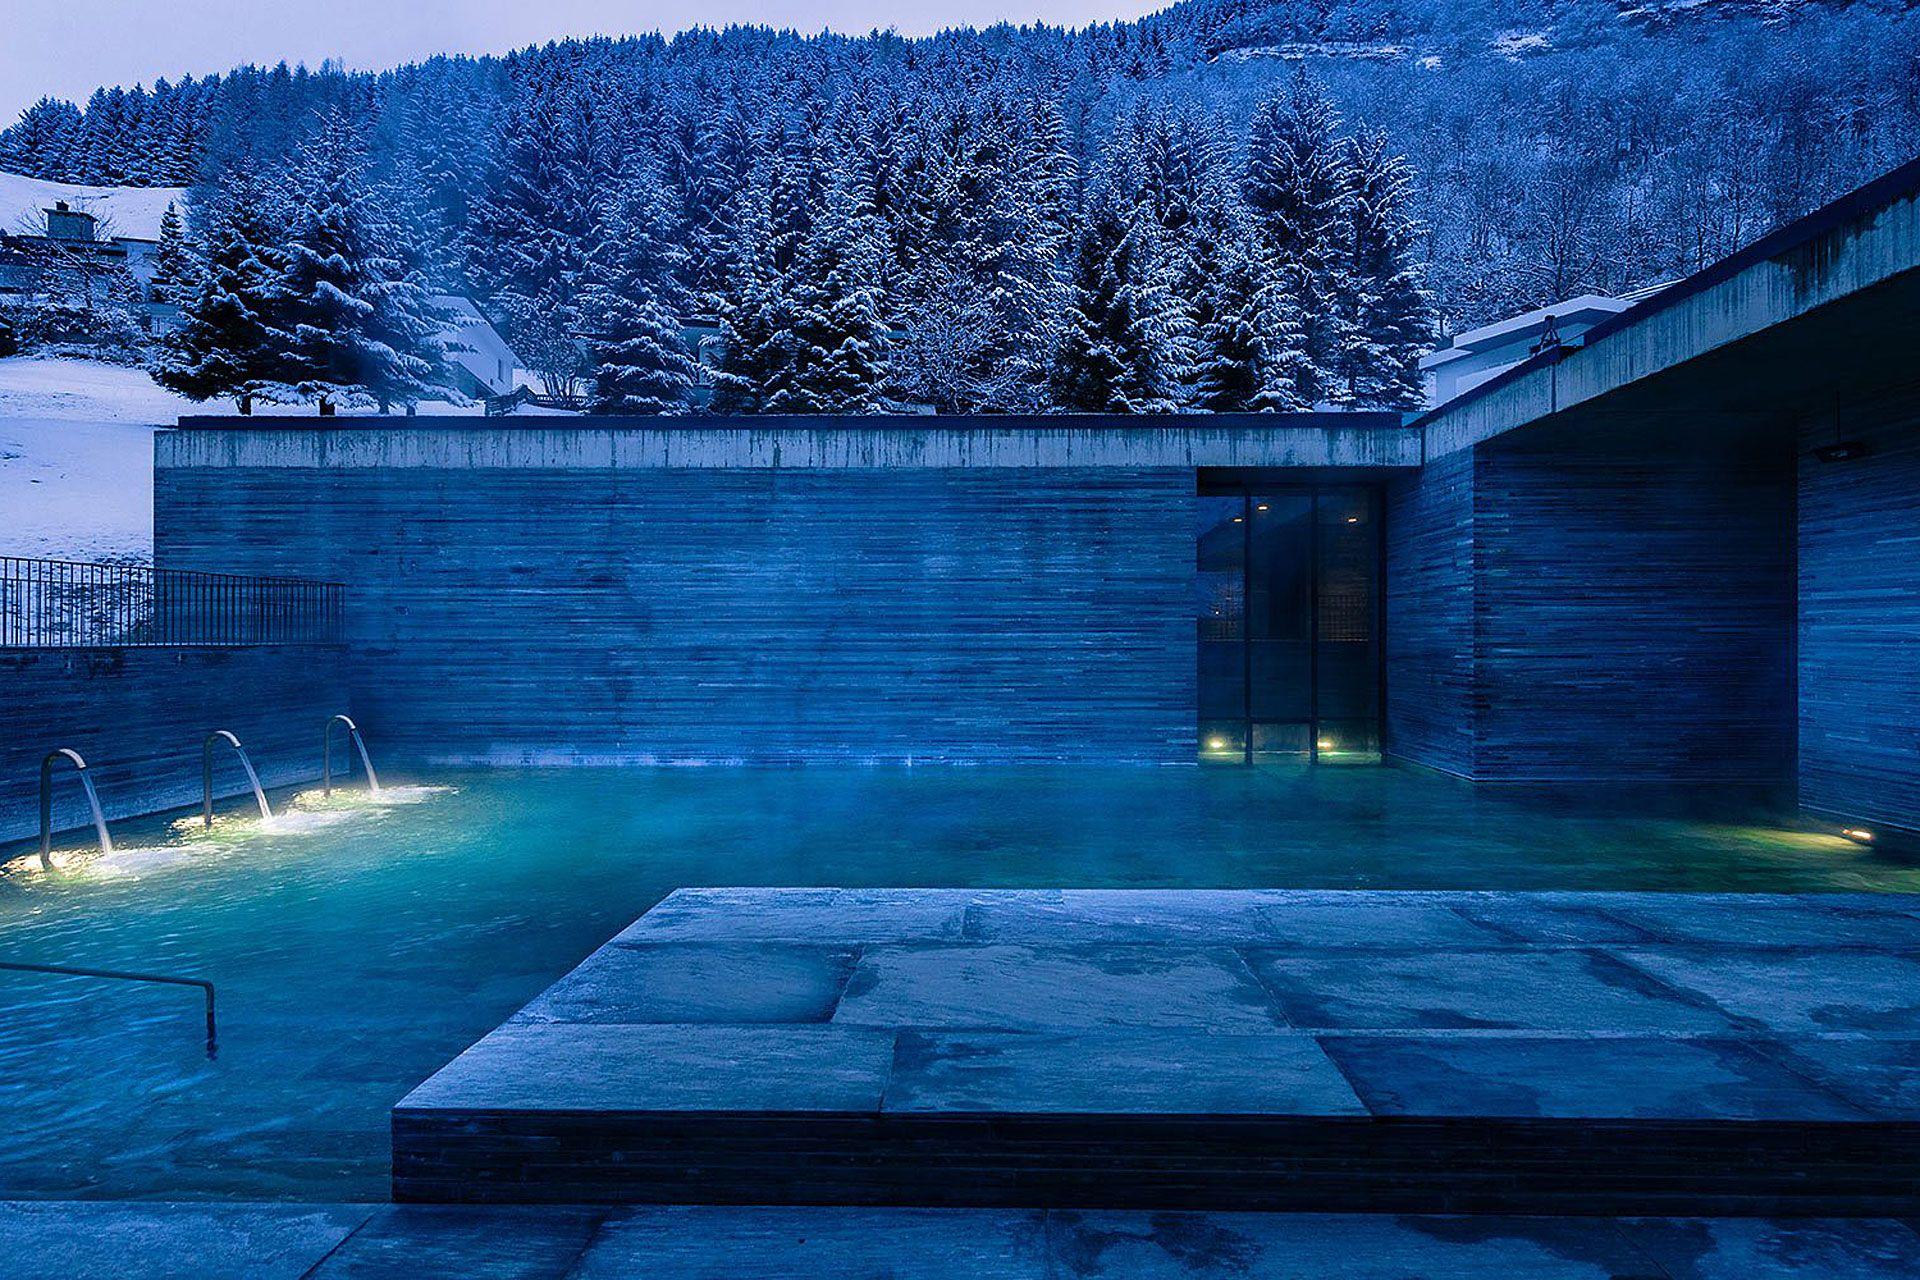 7132 Hotel | Hotel, Architecture, Ski hotel